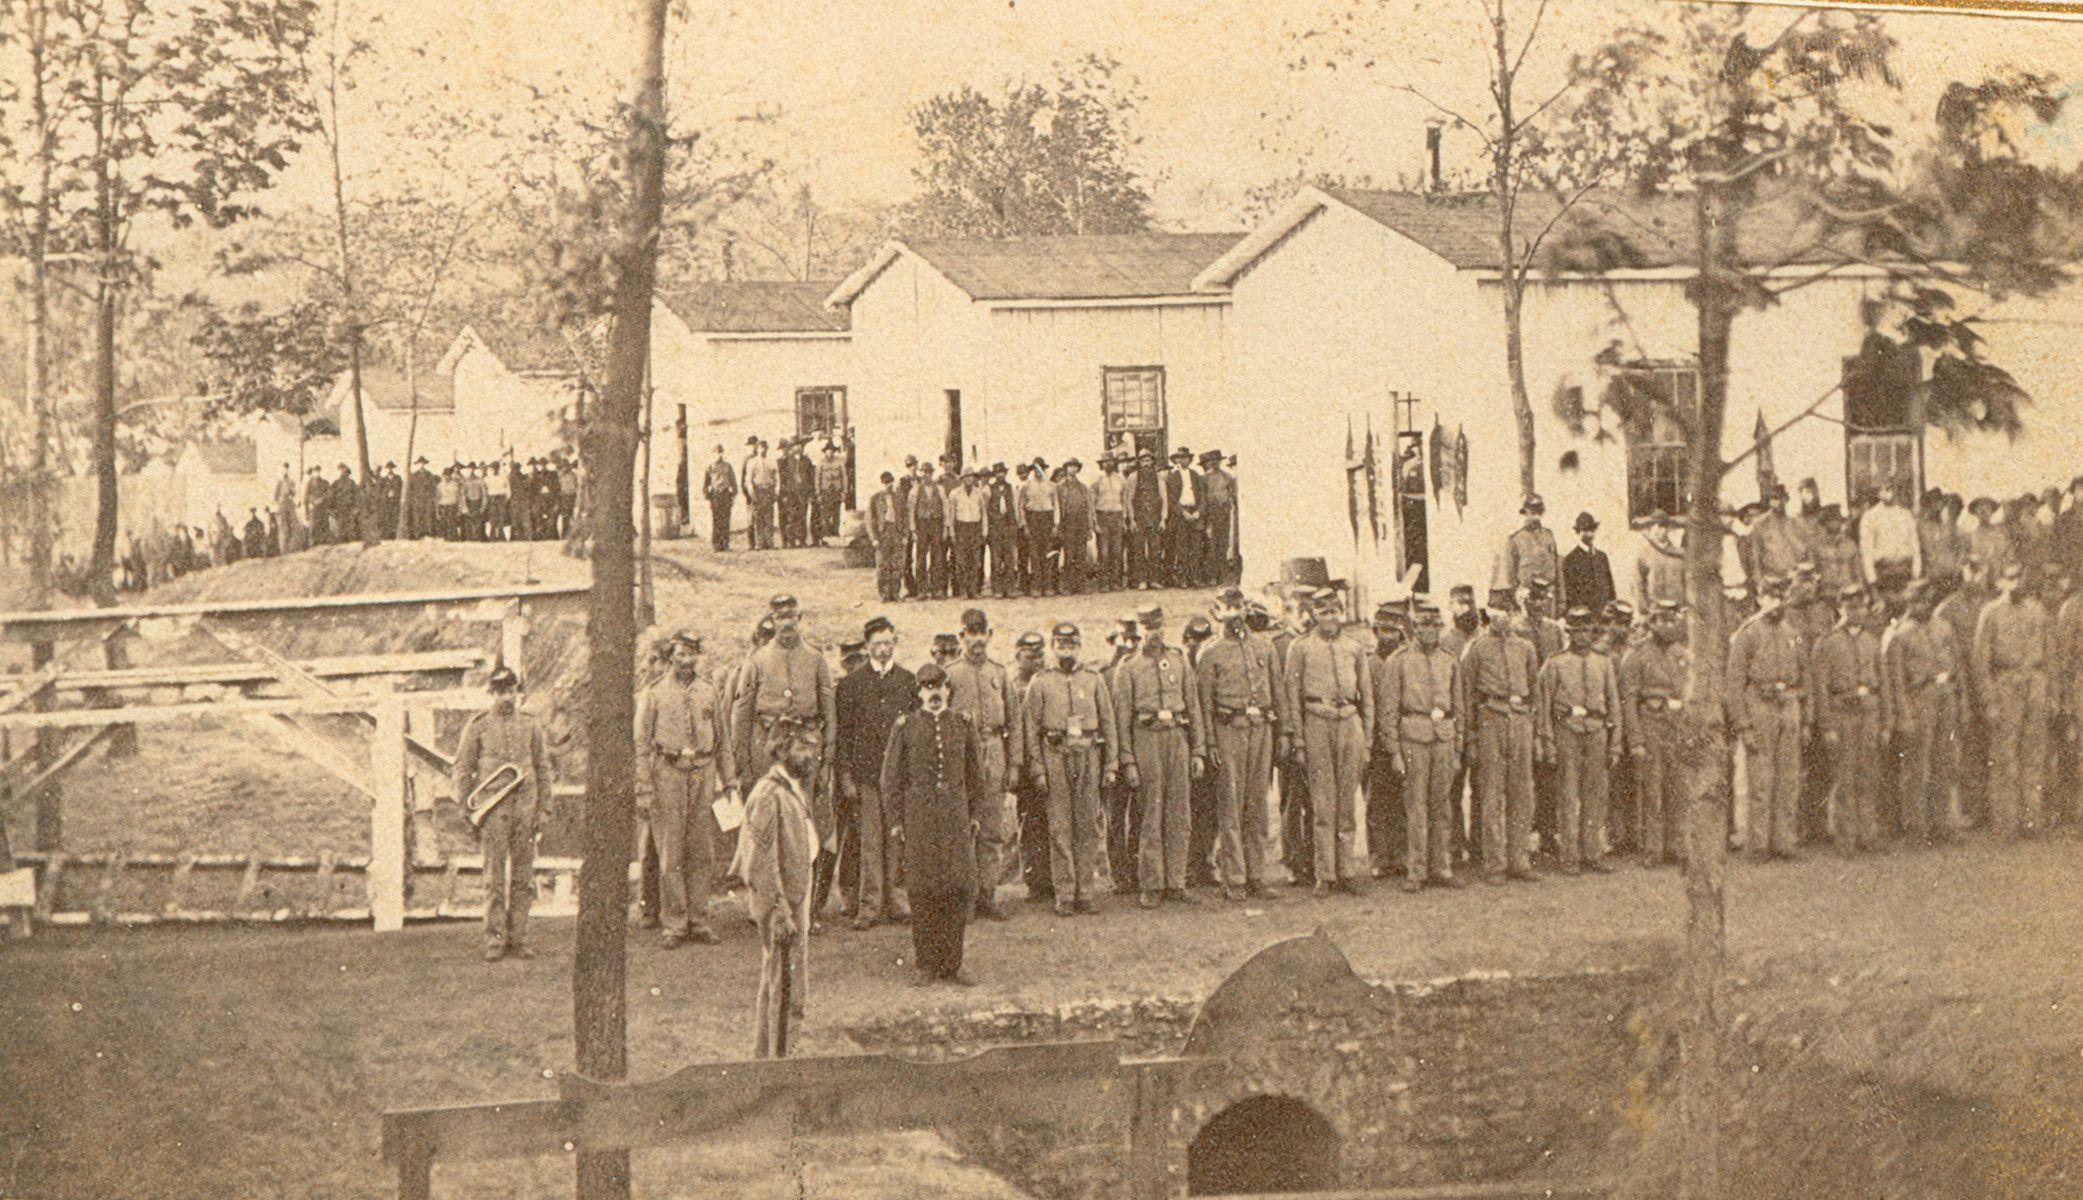 Pin By Mike Vandemark On Civil War Era American Civil War Mexican American War Prisoner Of War Camp